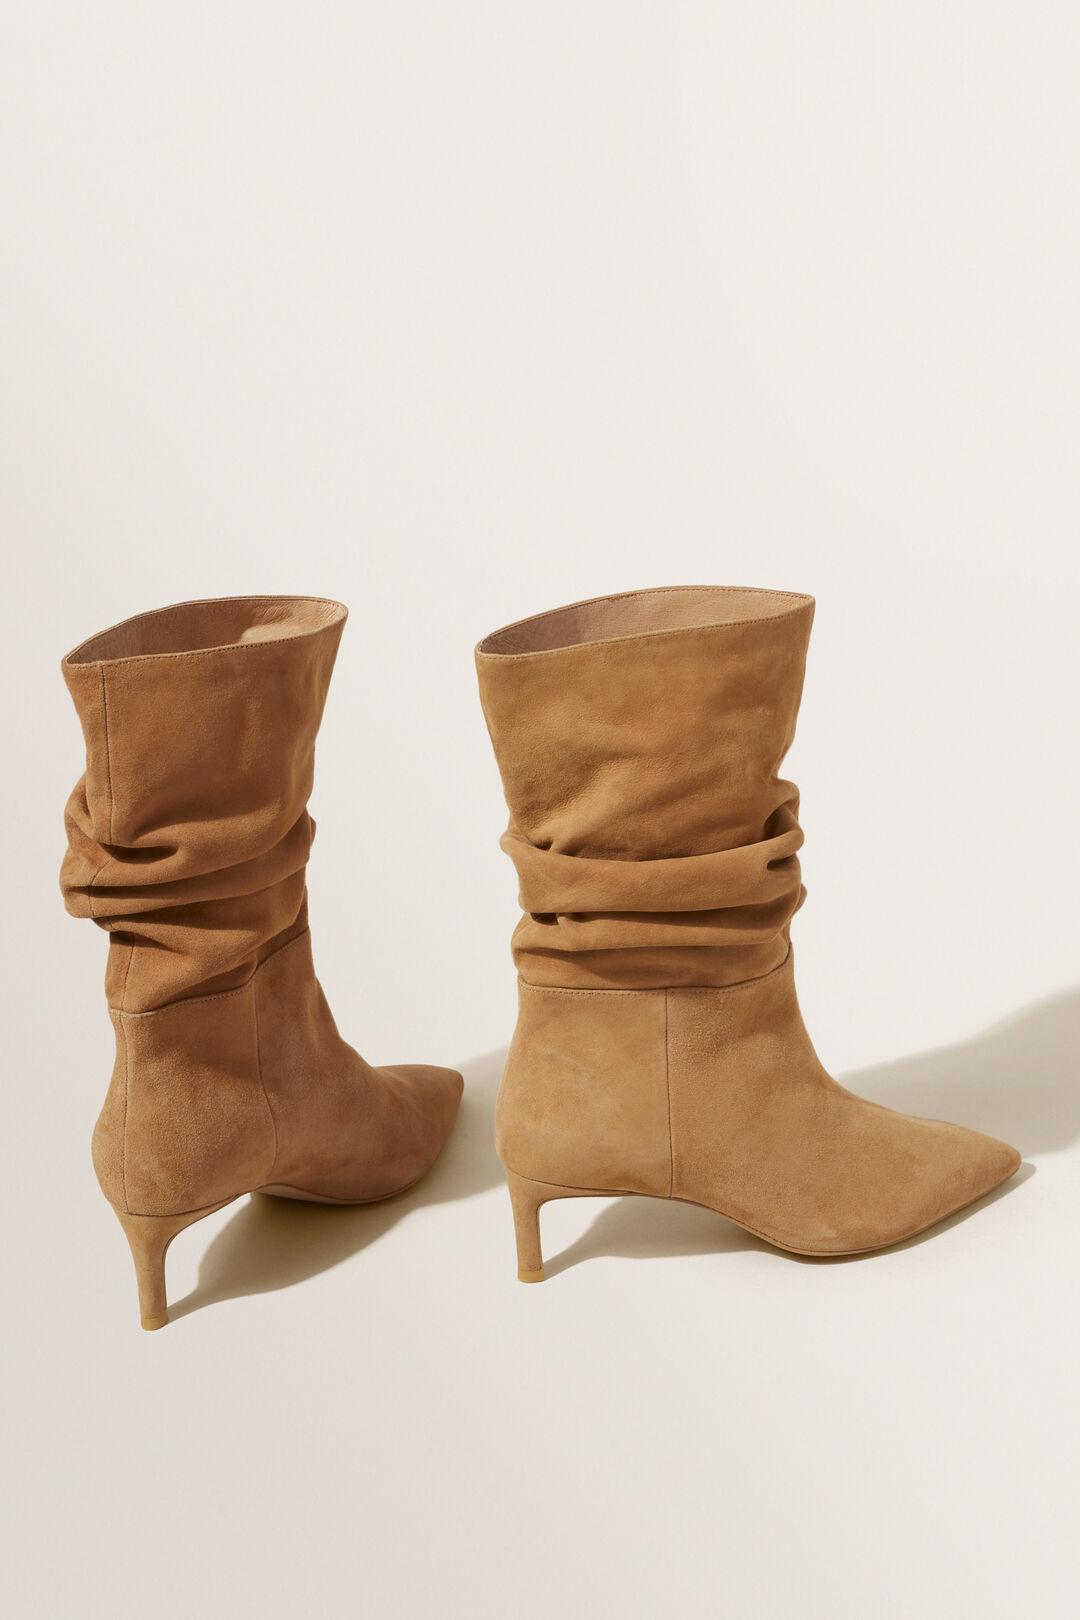 Frankie Heeled Boot  Honey Tan  hi-res